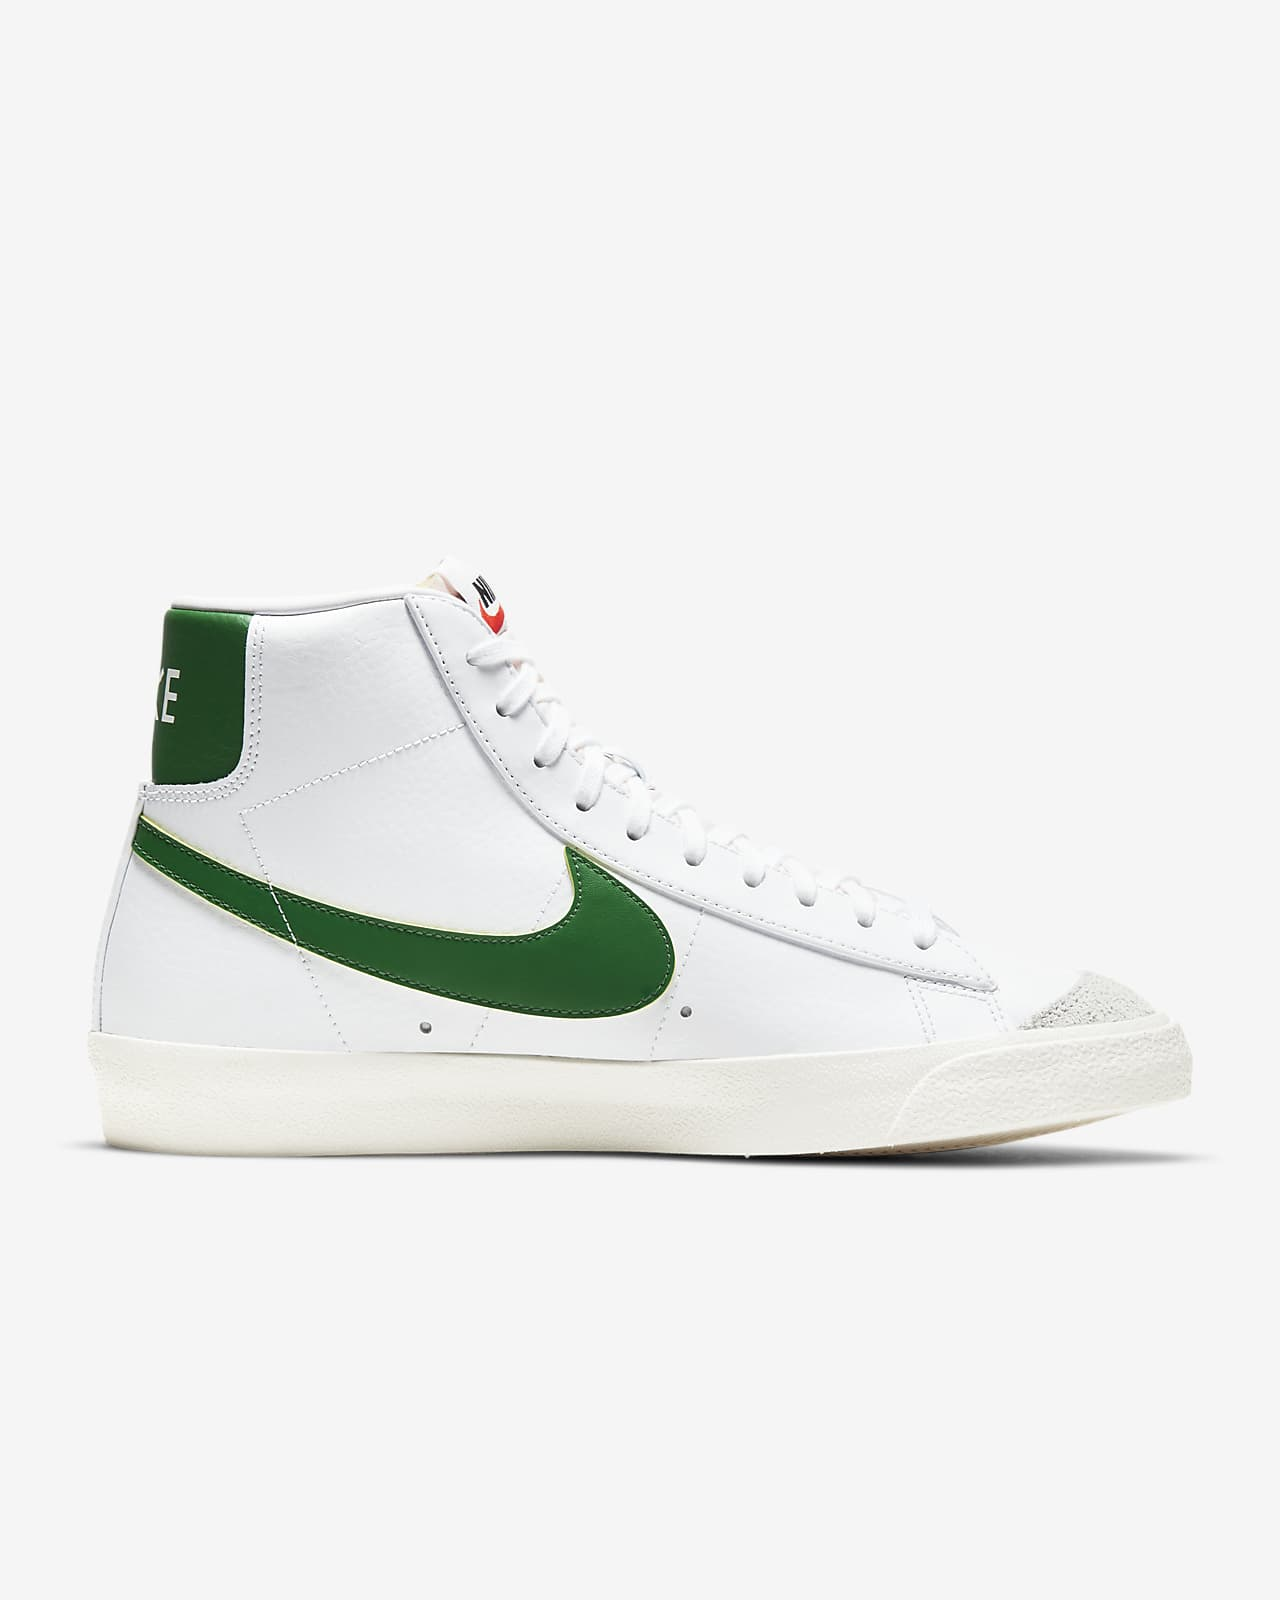 Blazer Mid '77 Vintage 'White Pine Green'